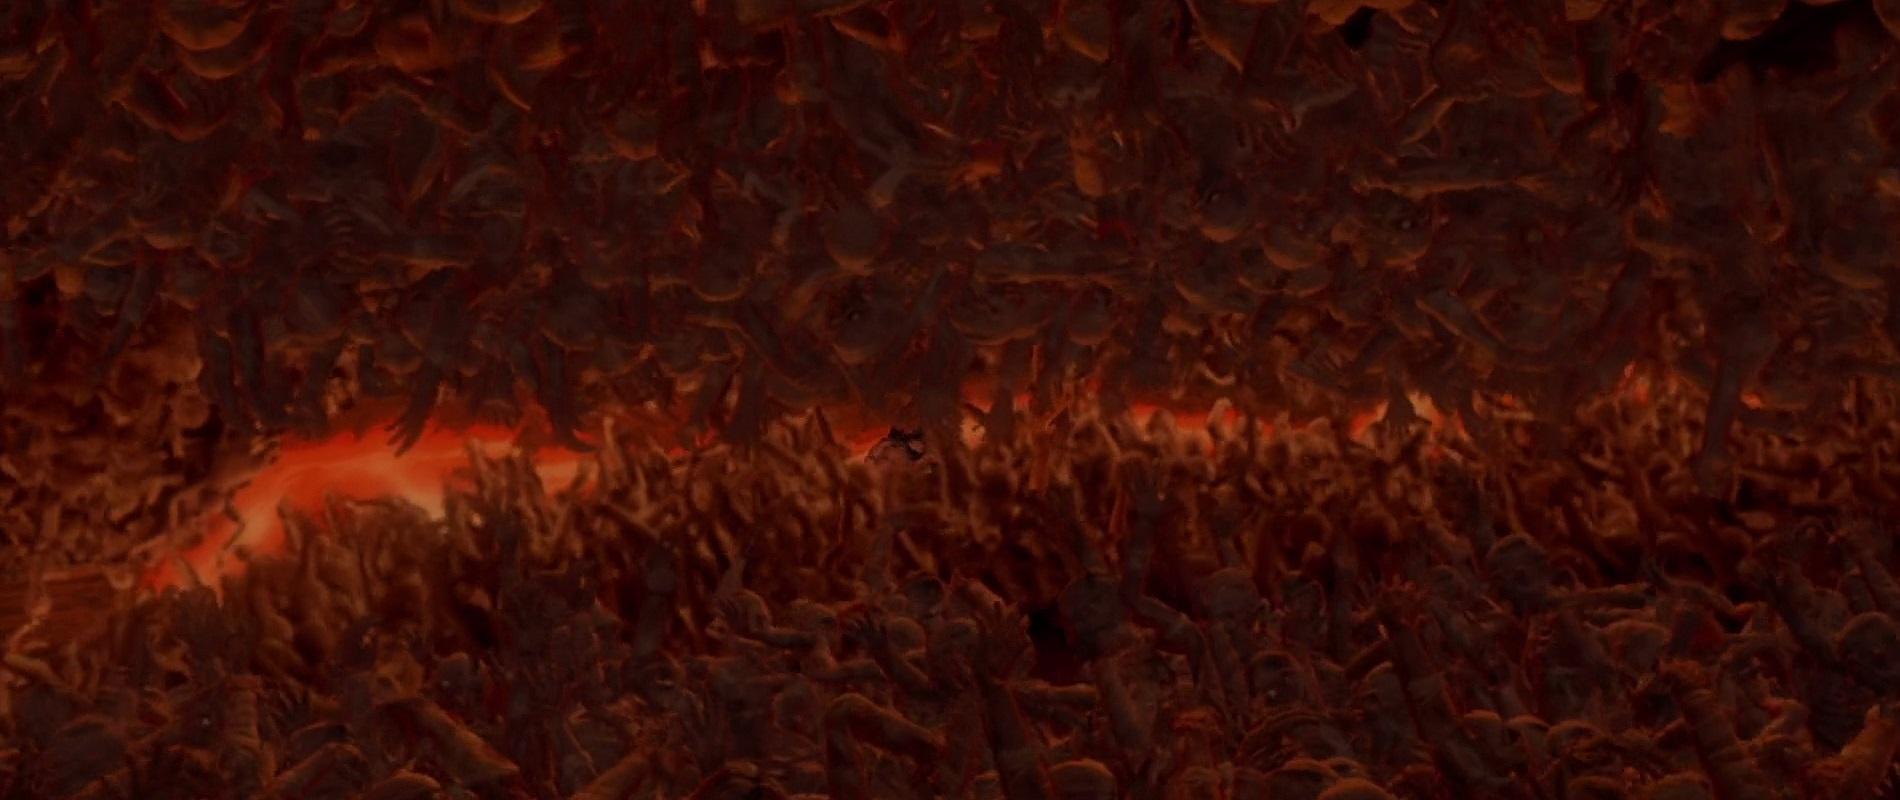 Underworld (The Mummy)